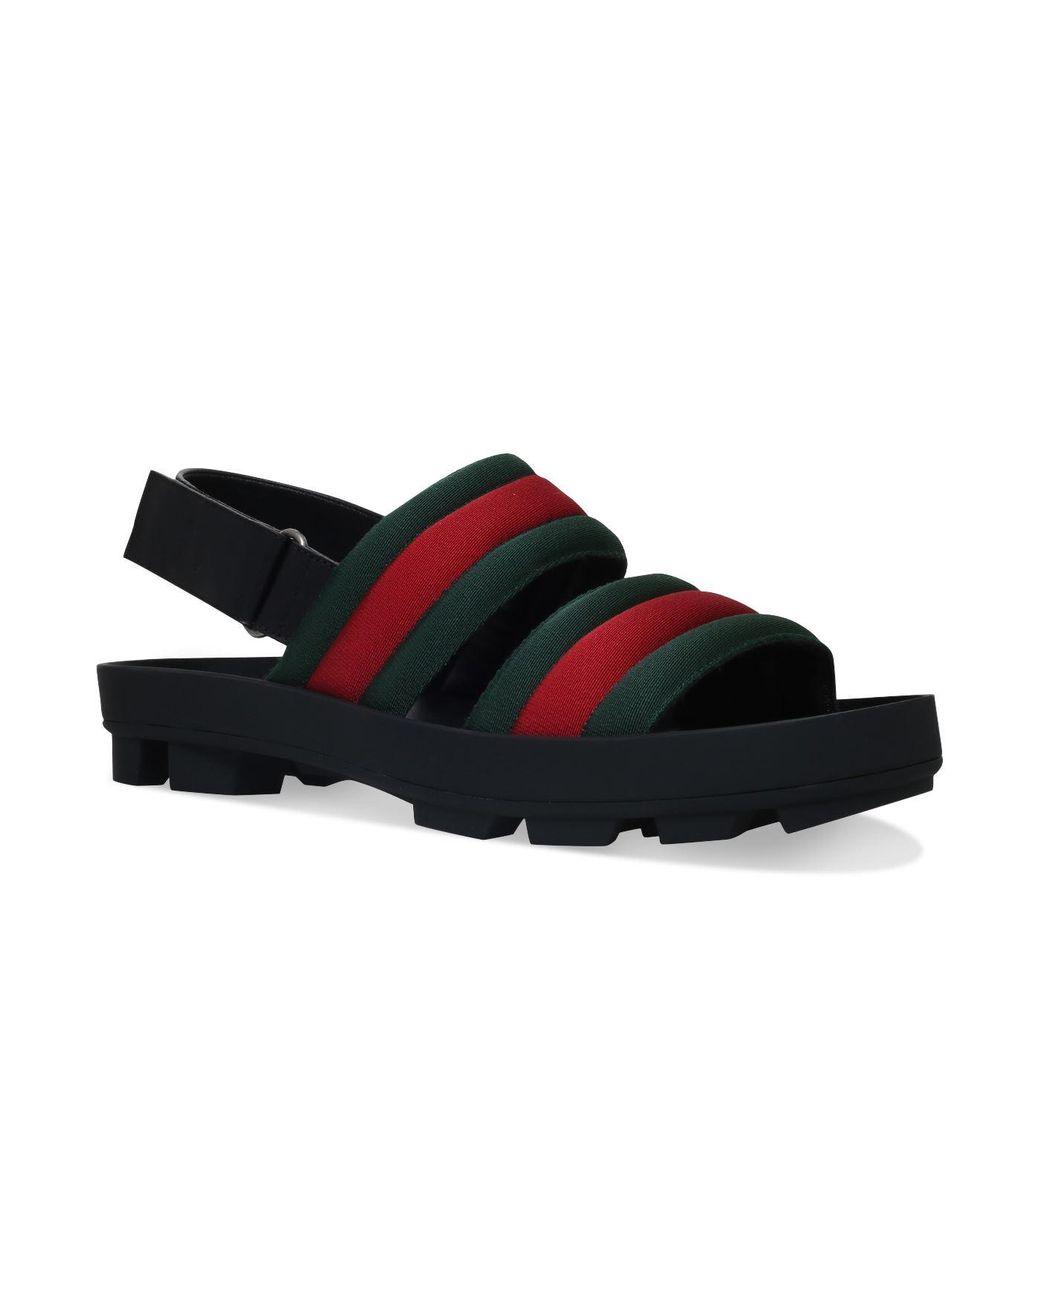 b7adff1bf Gucci Sam Webbed Sandals in Black for Men - Lyst